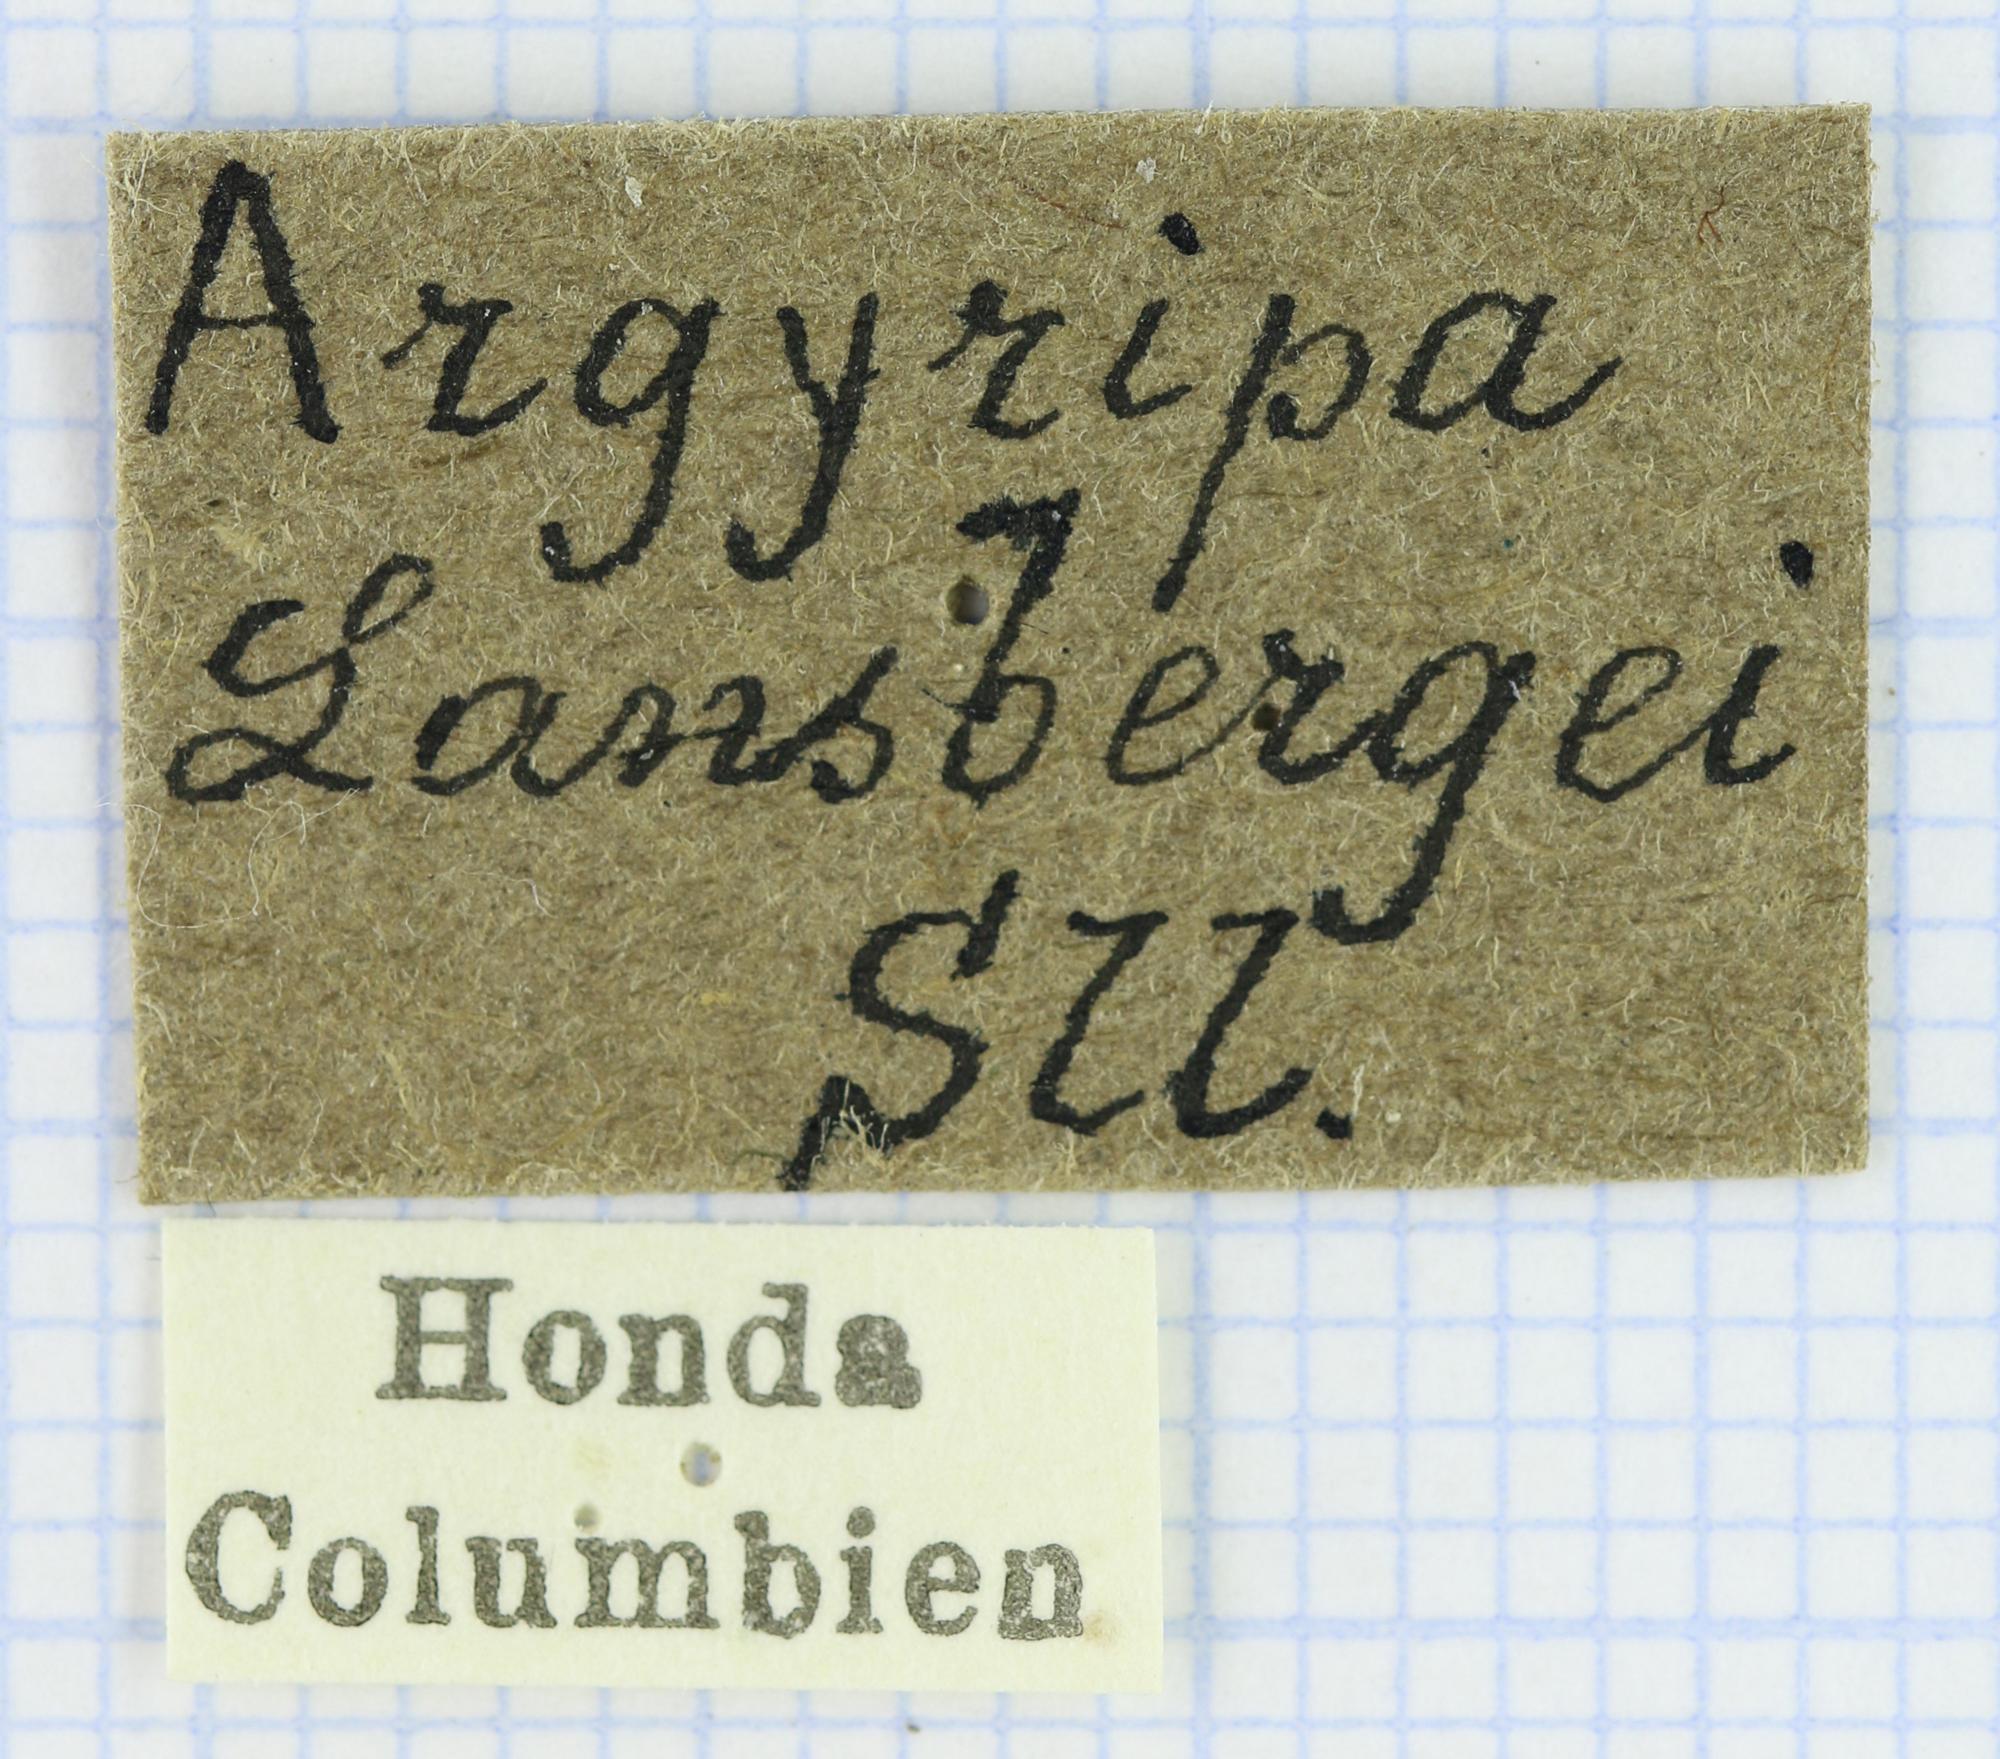 Argyripa lansbergei 23634.jpg